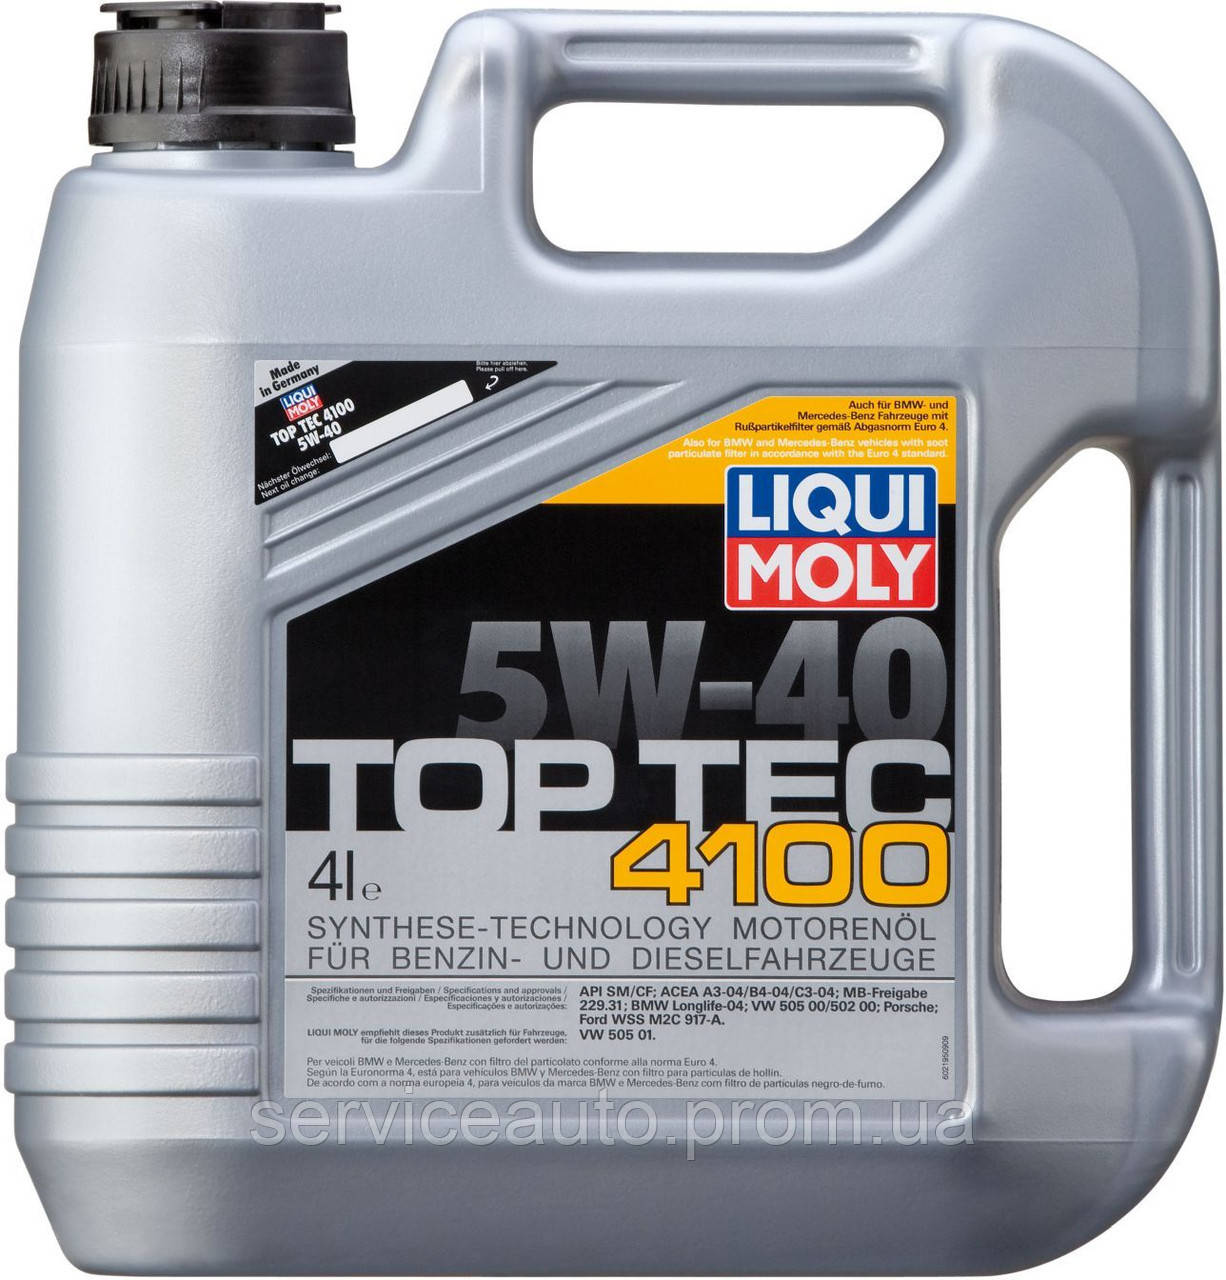 Моторное масло Liqui Moly Top Tec 4100 5W-40 4л. (Lic7547)